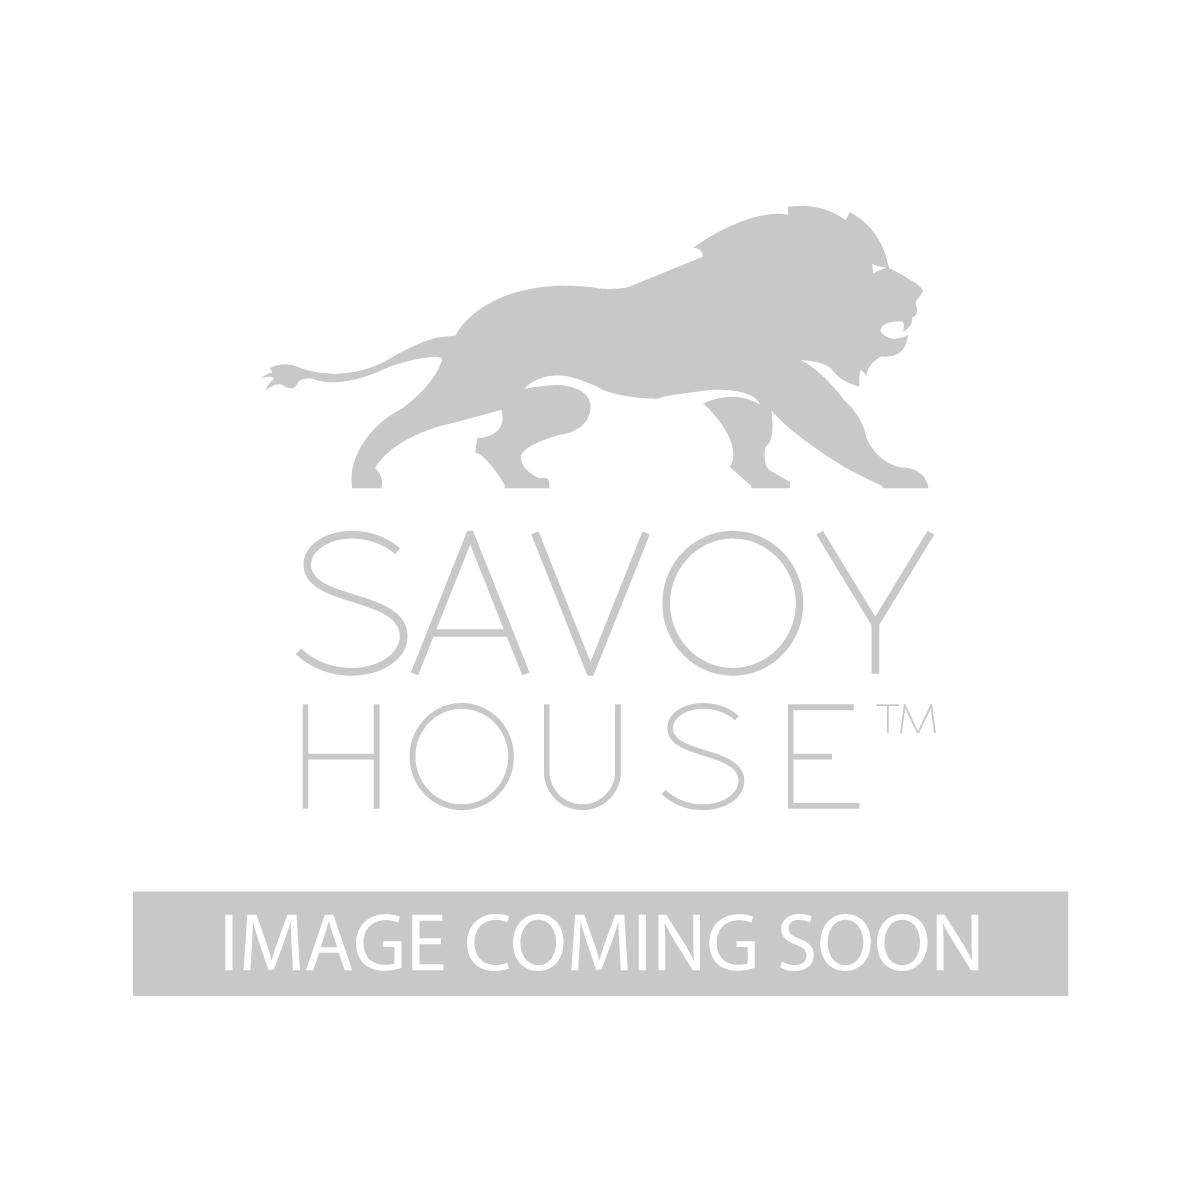 60 5025 3SV SN La Salle 60 inch 3 Blade Ceiling Fan by Savoy House